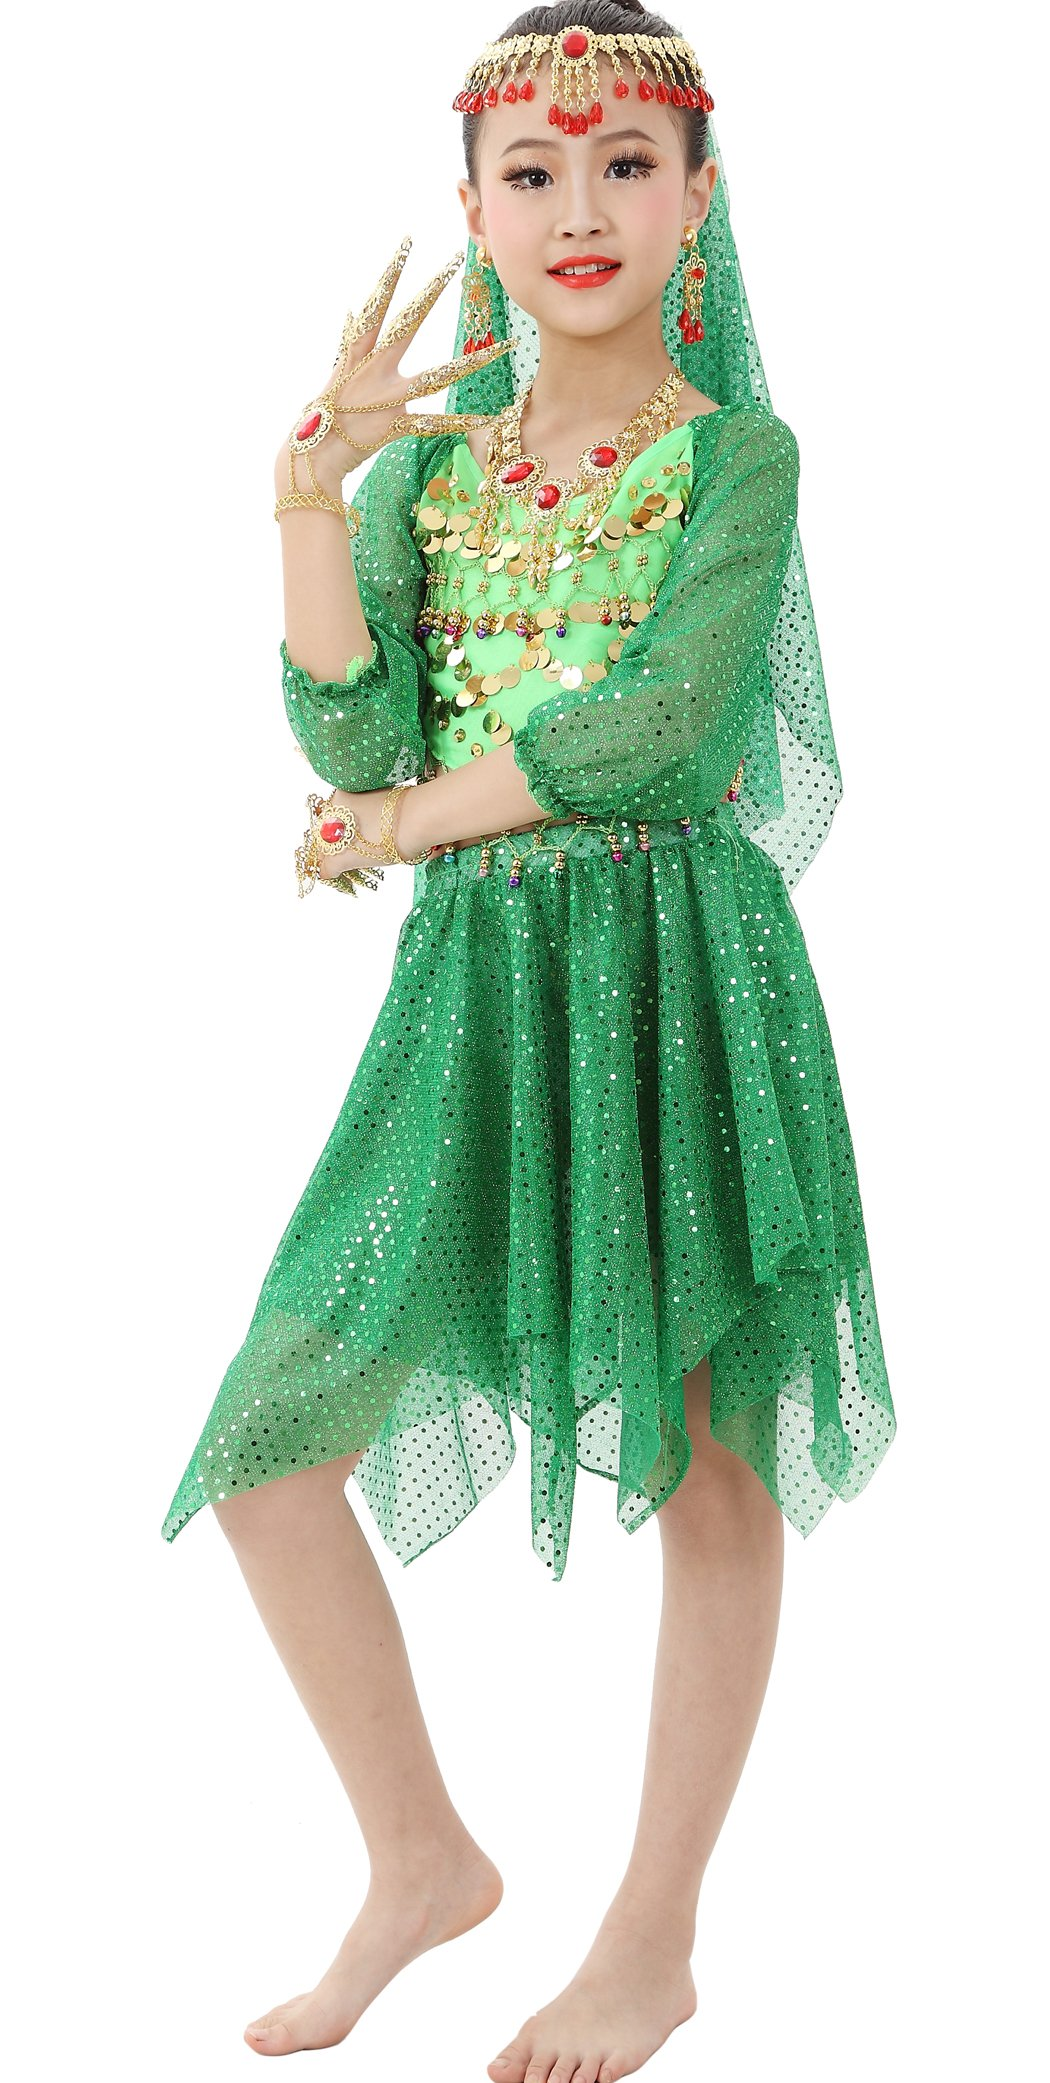 Astage Girls Performance Dance Costume Green